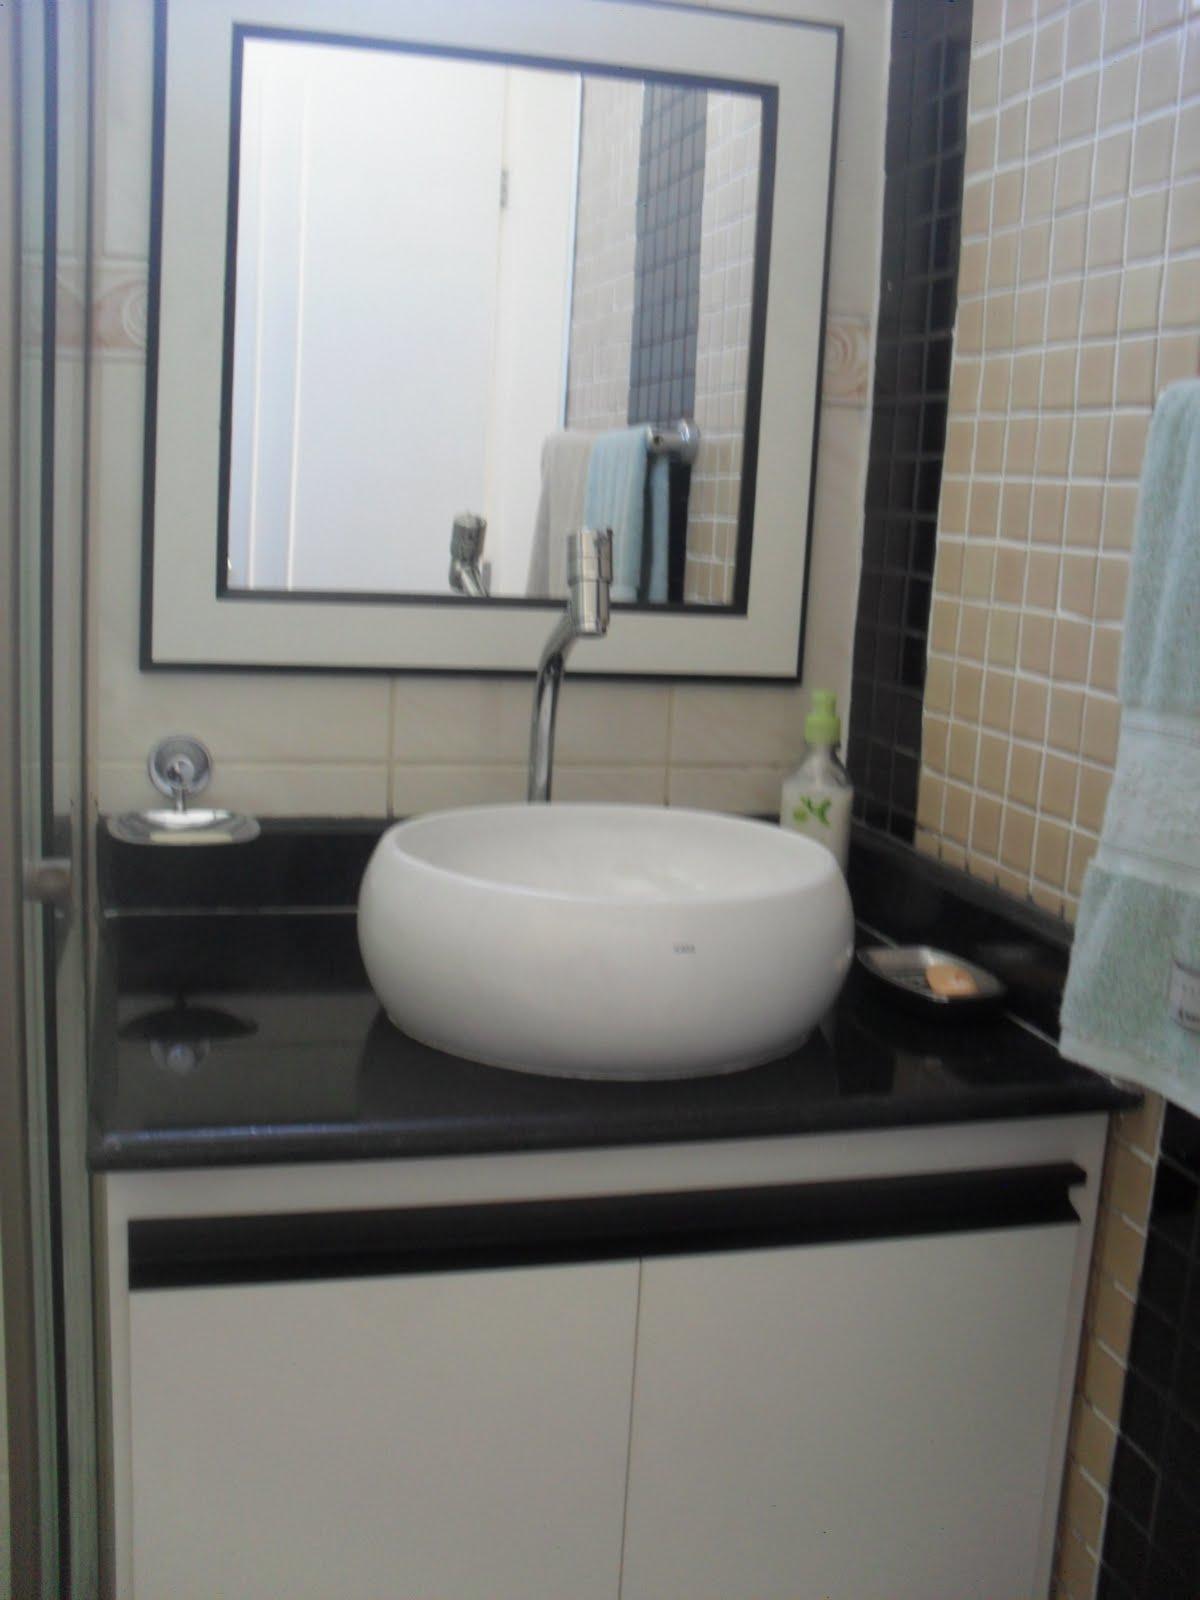 ART MAX Marcenaria: gabinete de banheiro #594F41 1200 1600